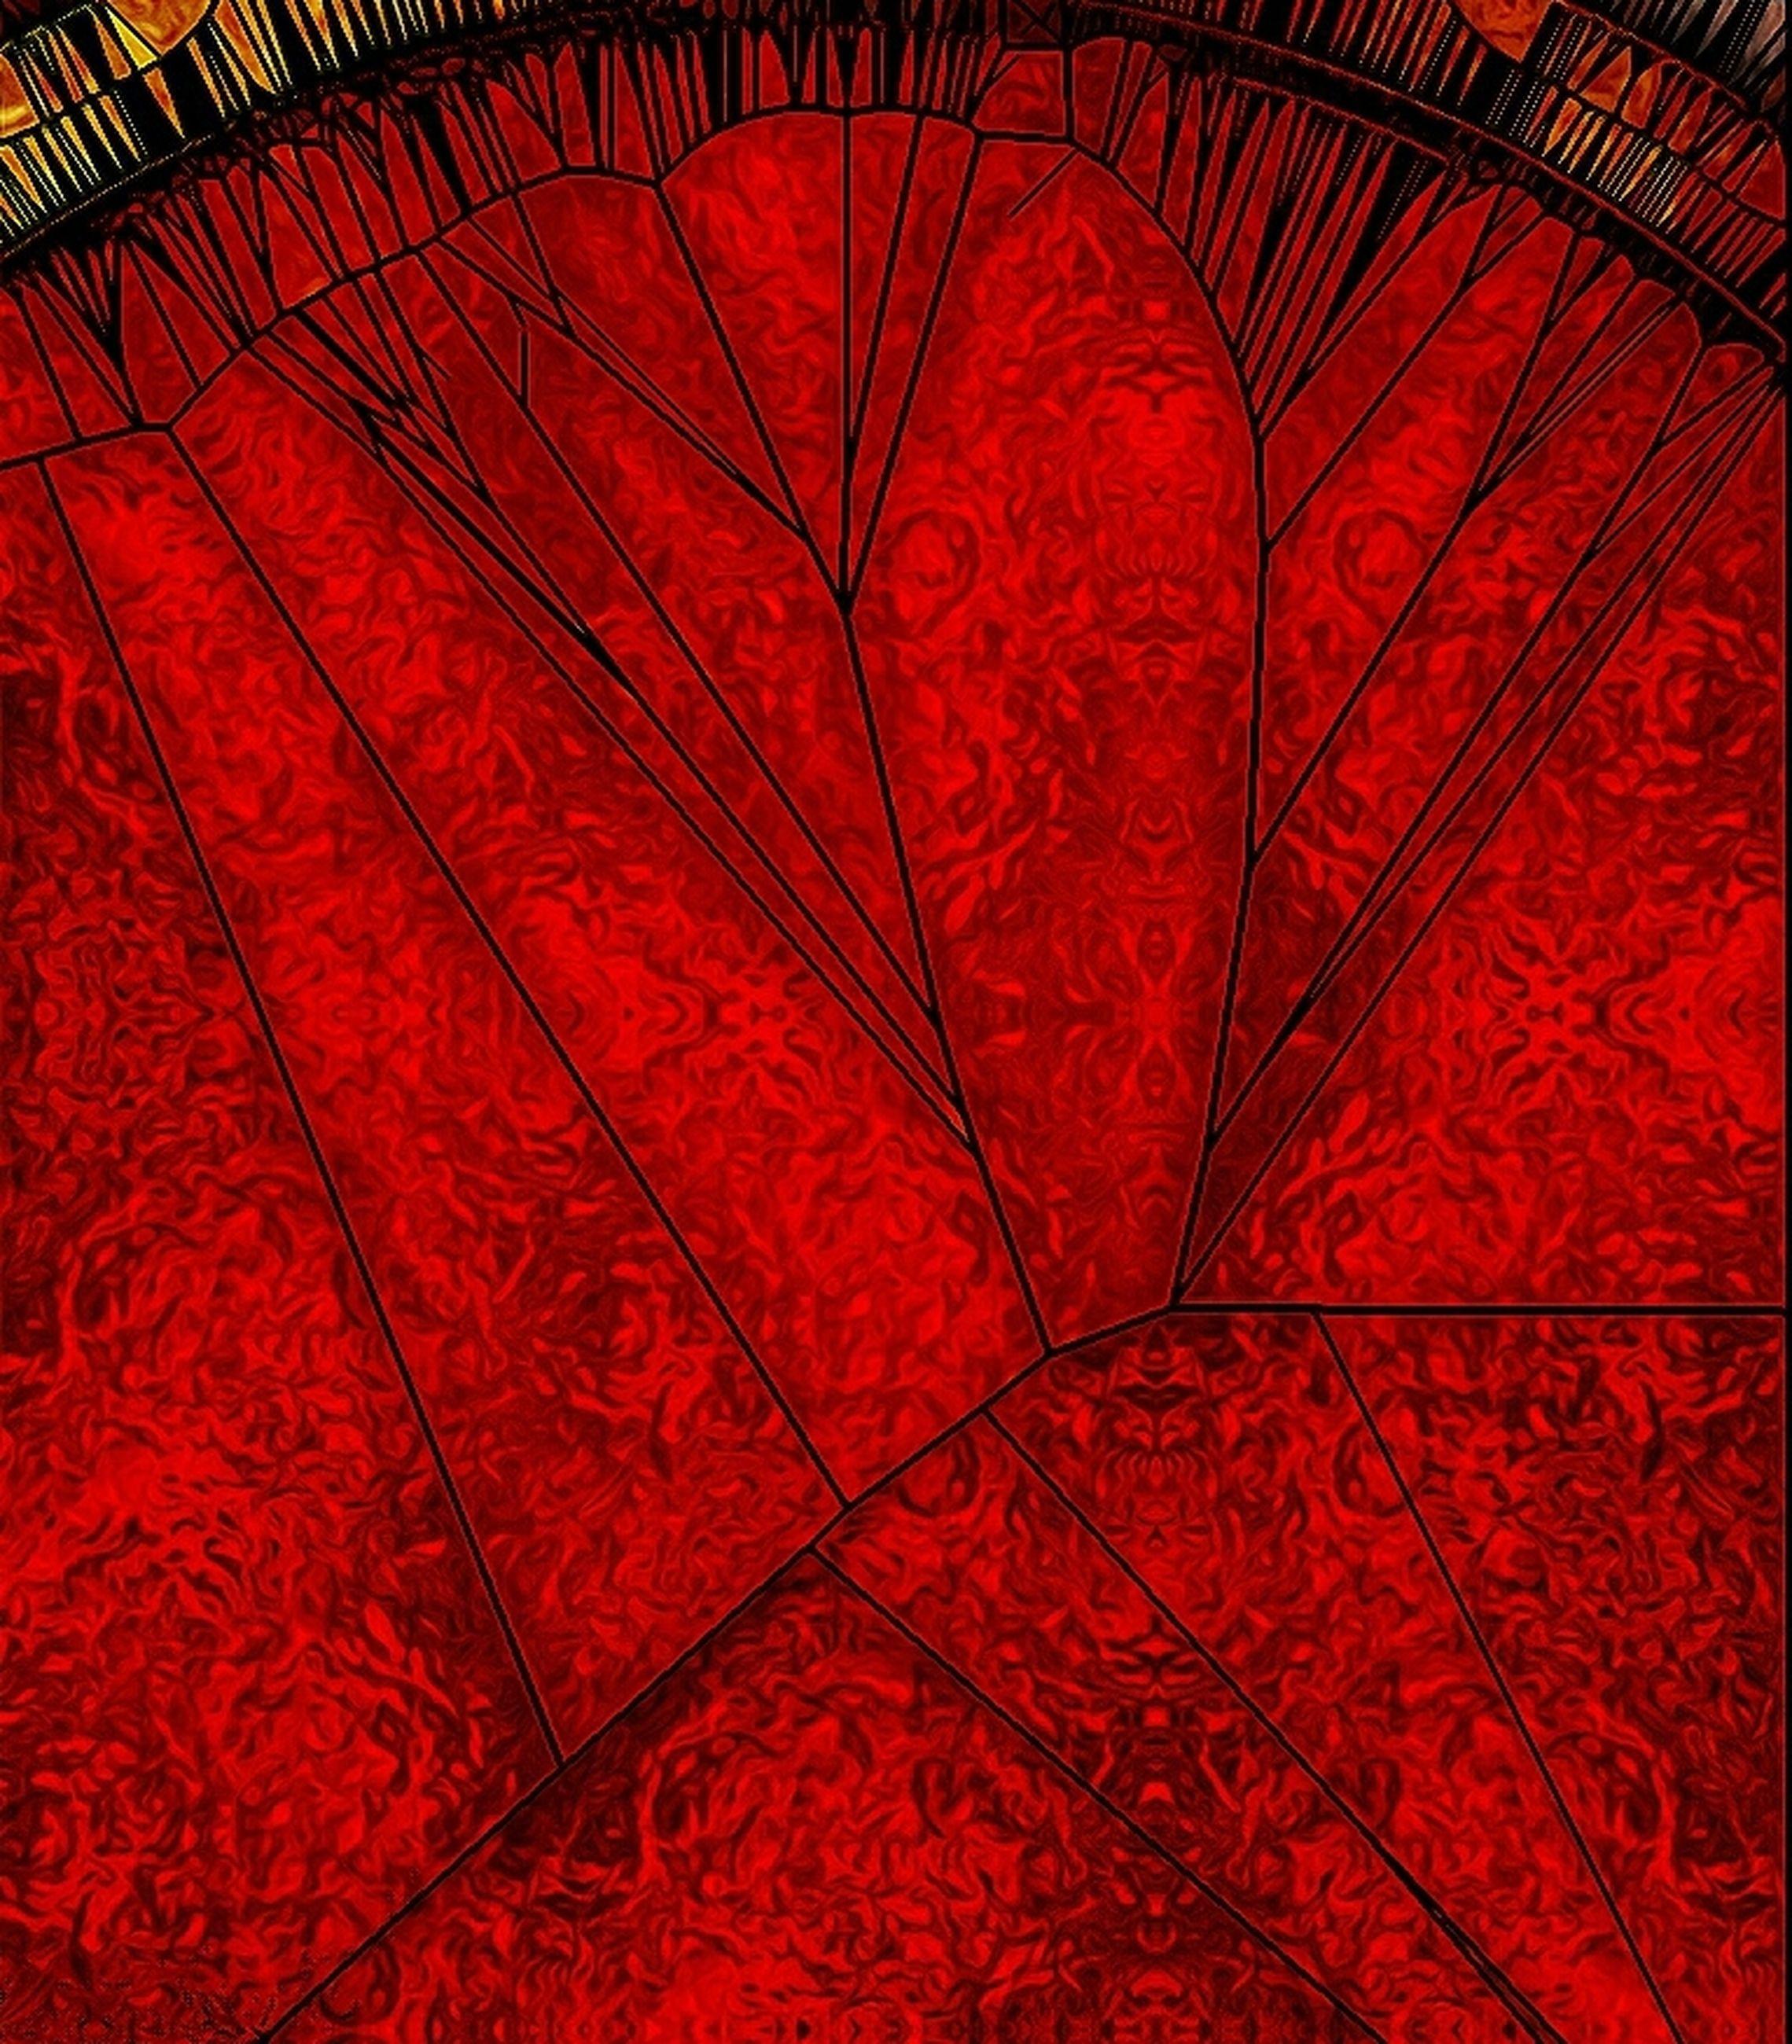 red, full frame, backgrounds, vibrant color, leaf vein, close-up, leaf, red color, extreme close-up, softness, red background